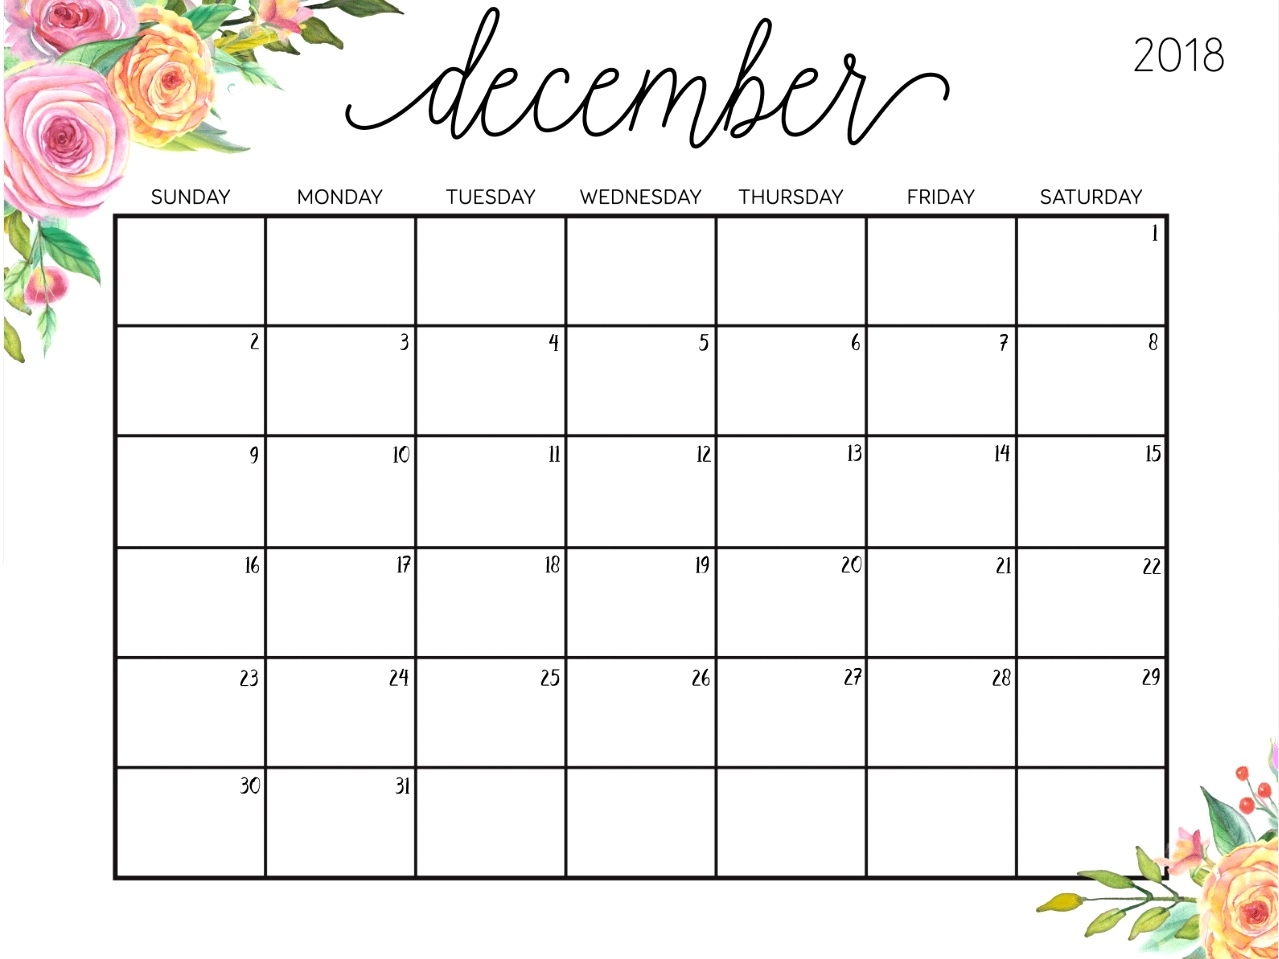 december 2018 cute calendar printable printable calendar 2018::December 2018 Calendar Cute